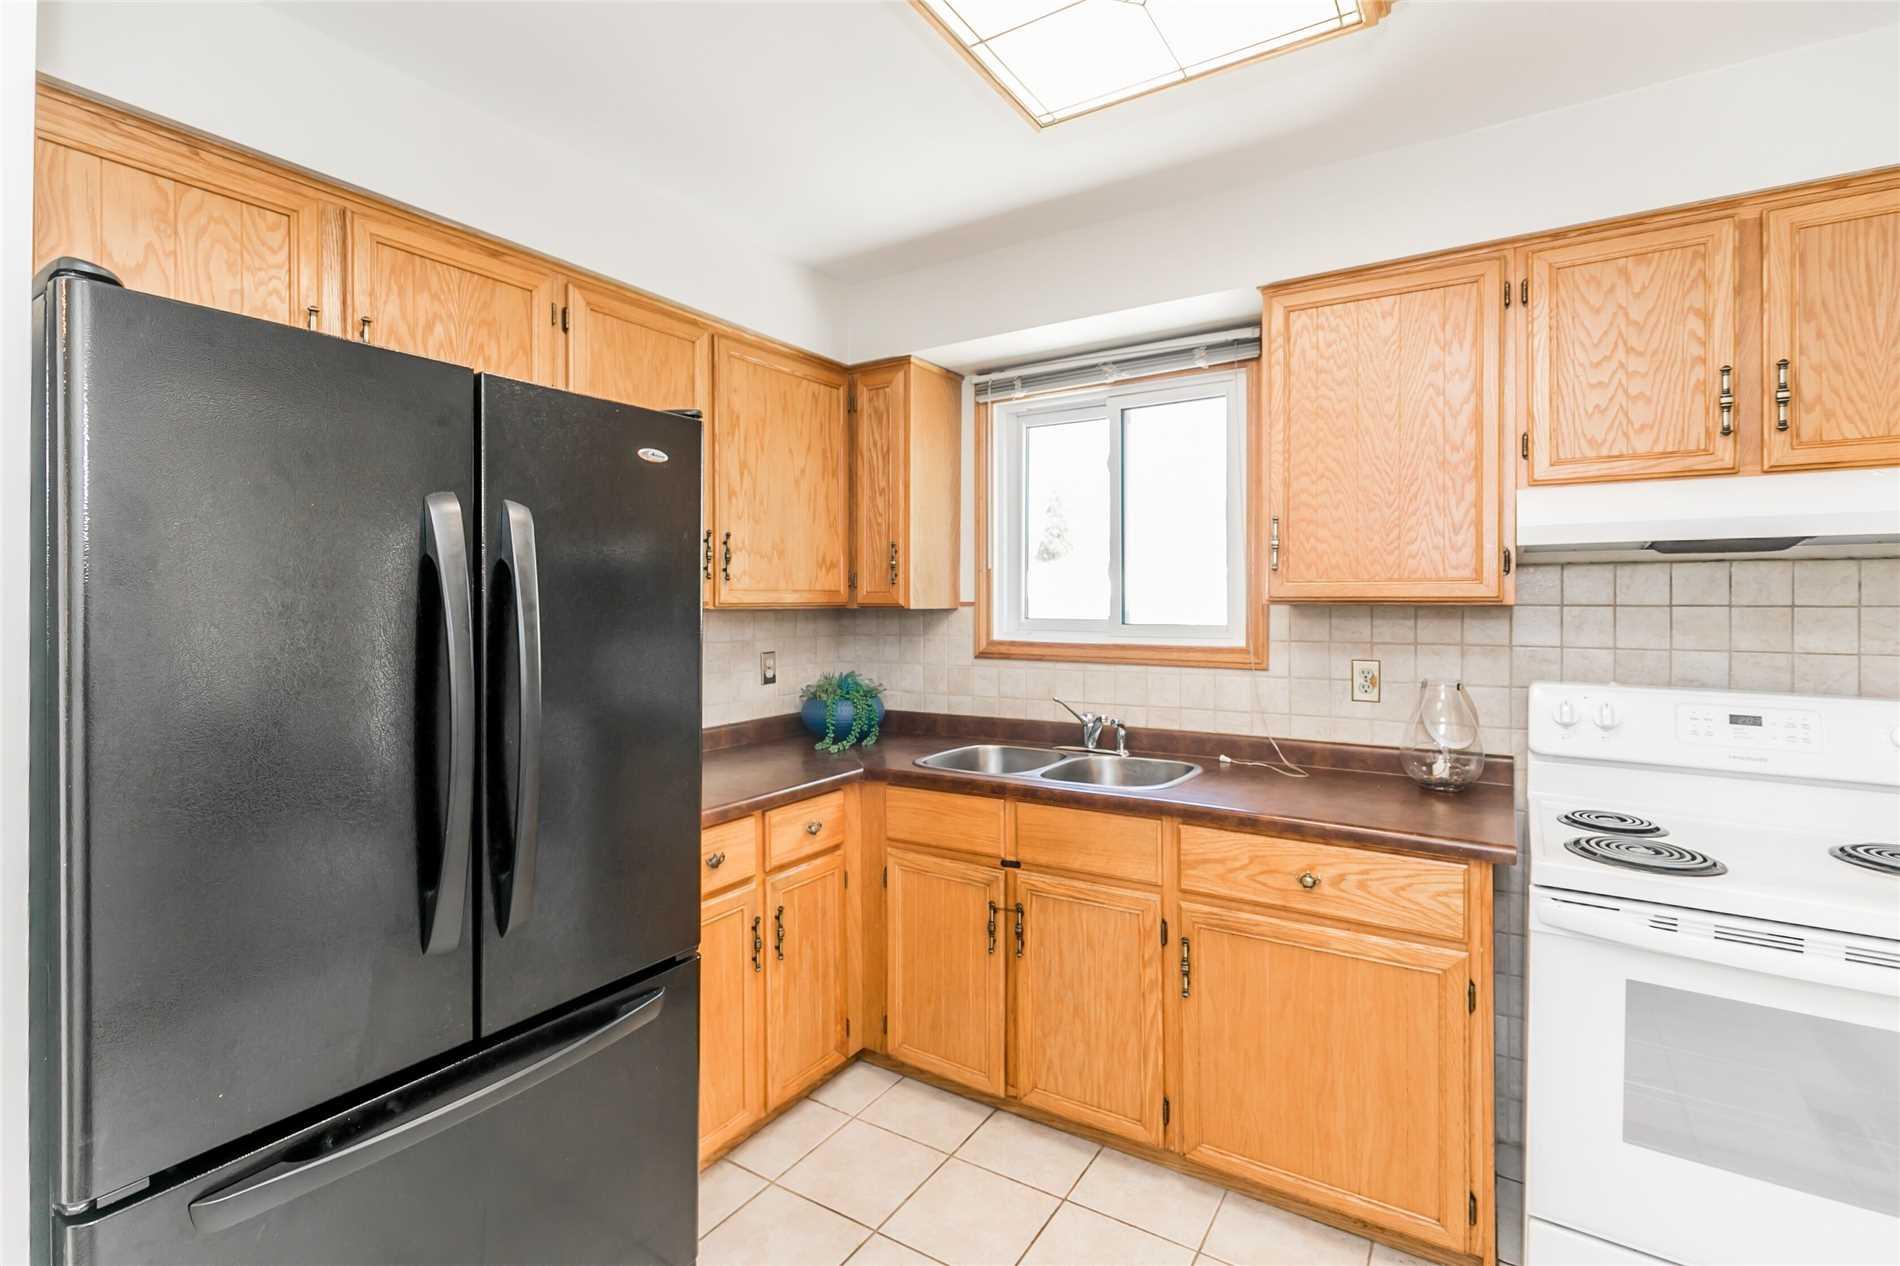 71 Hammell Blvd, New Tecumseth N4480387